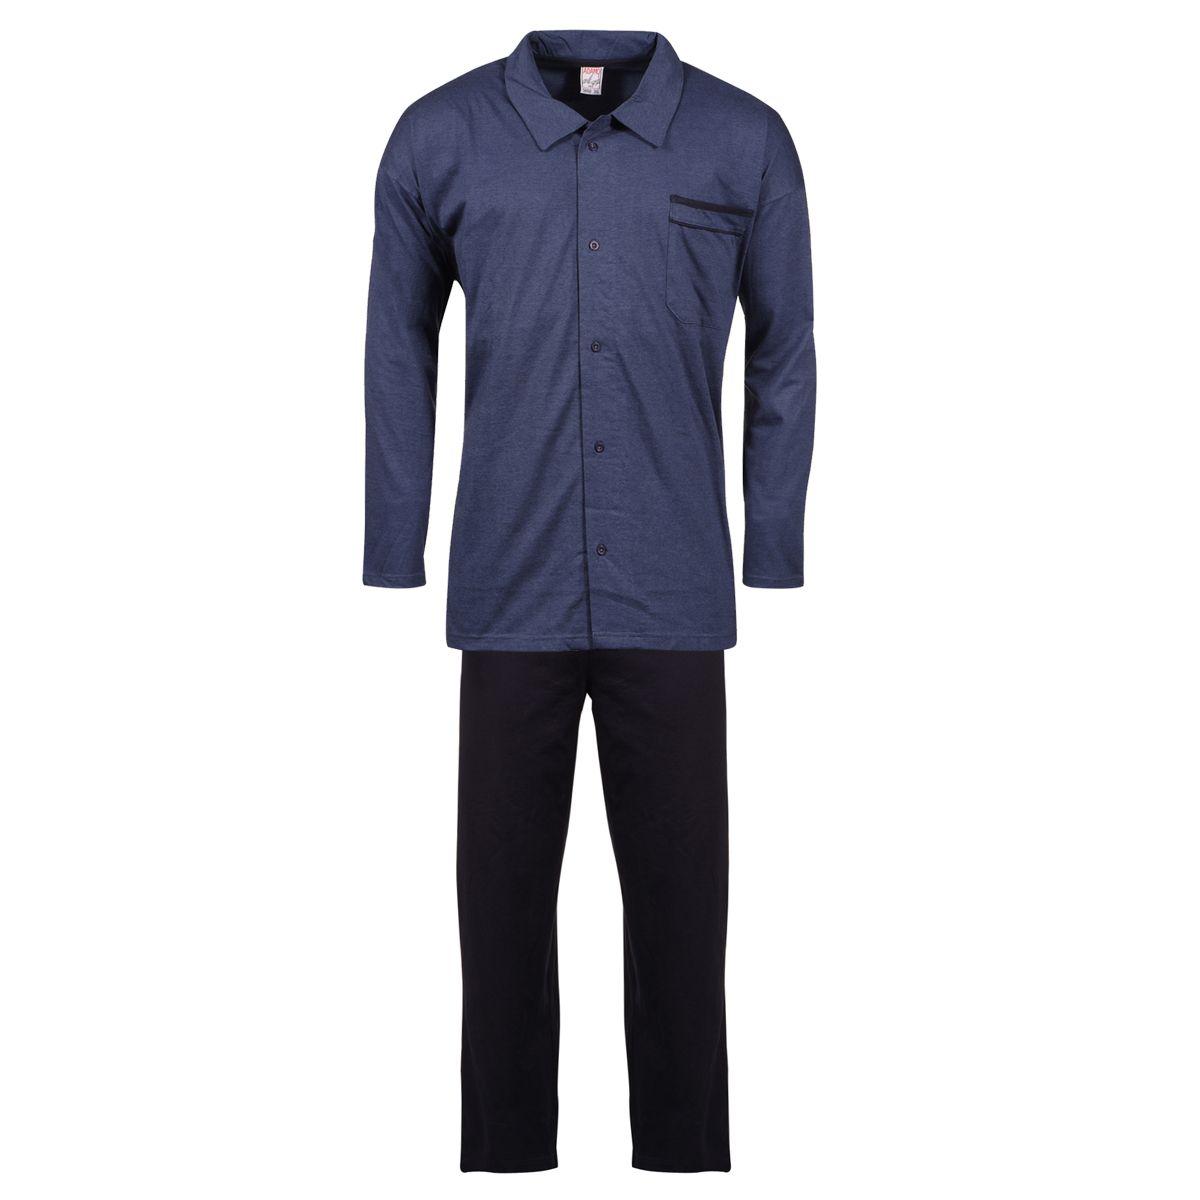 ensemble pyjama bleu grande taille du 3xl au 8xl size. Black Bedroom Furniture Sets. Home Design Ideas